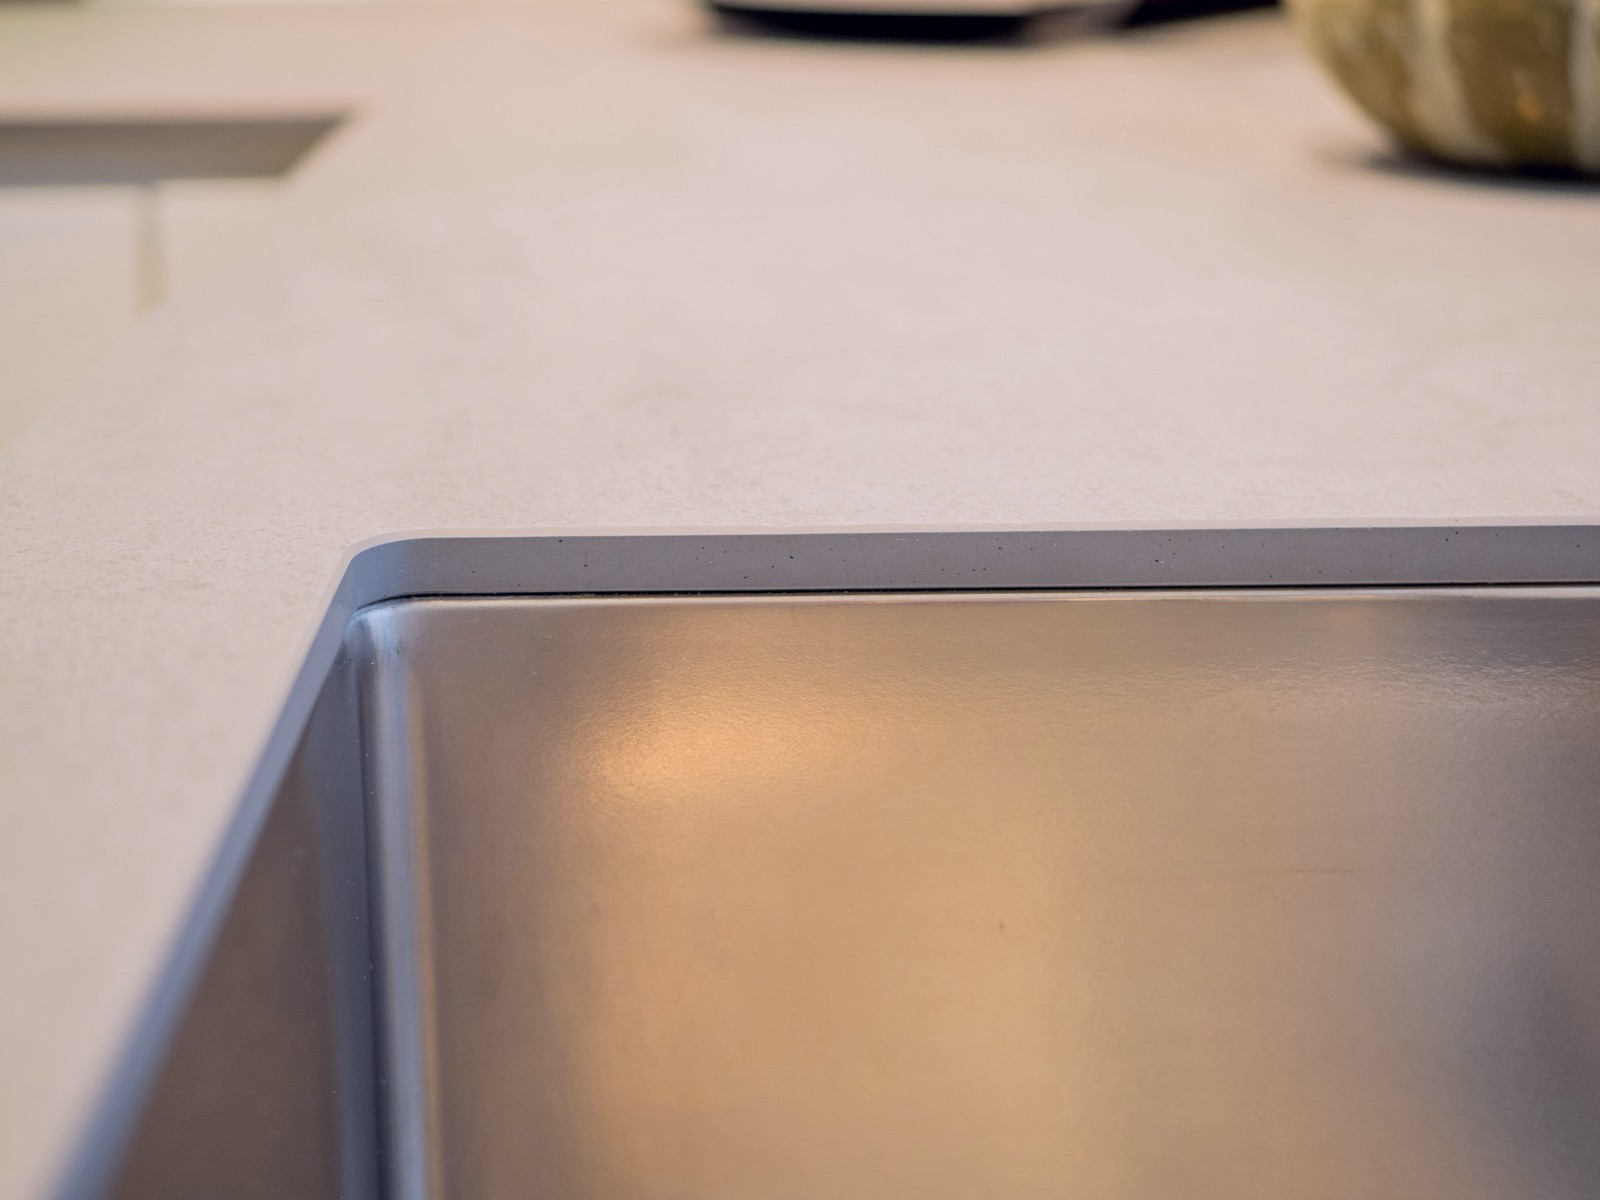 Helle Grifflose Kueche Lack Matt Weiss Keramikarbeitsplatte Miele Elektrogeraeten Bora Classic Muldenluefter 8